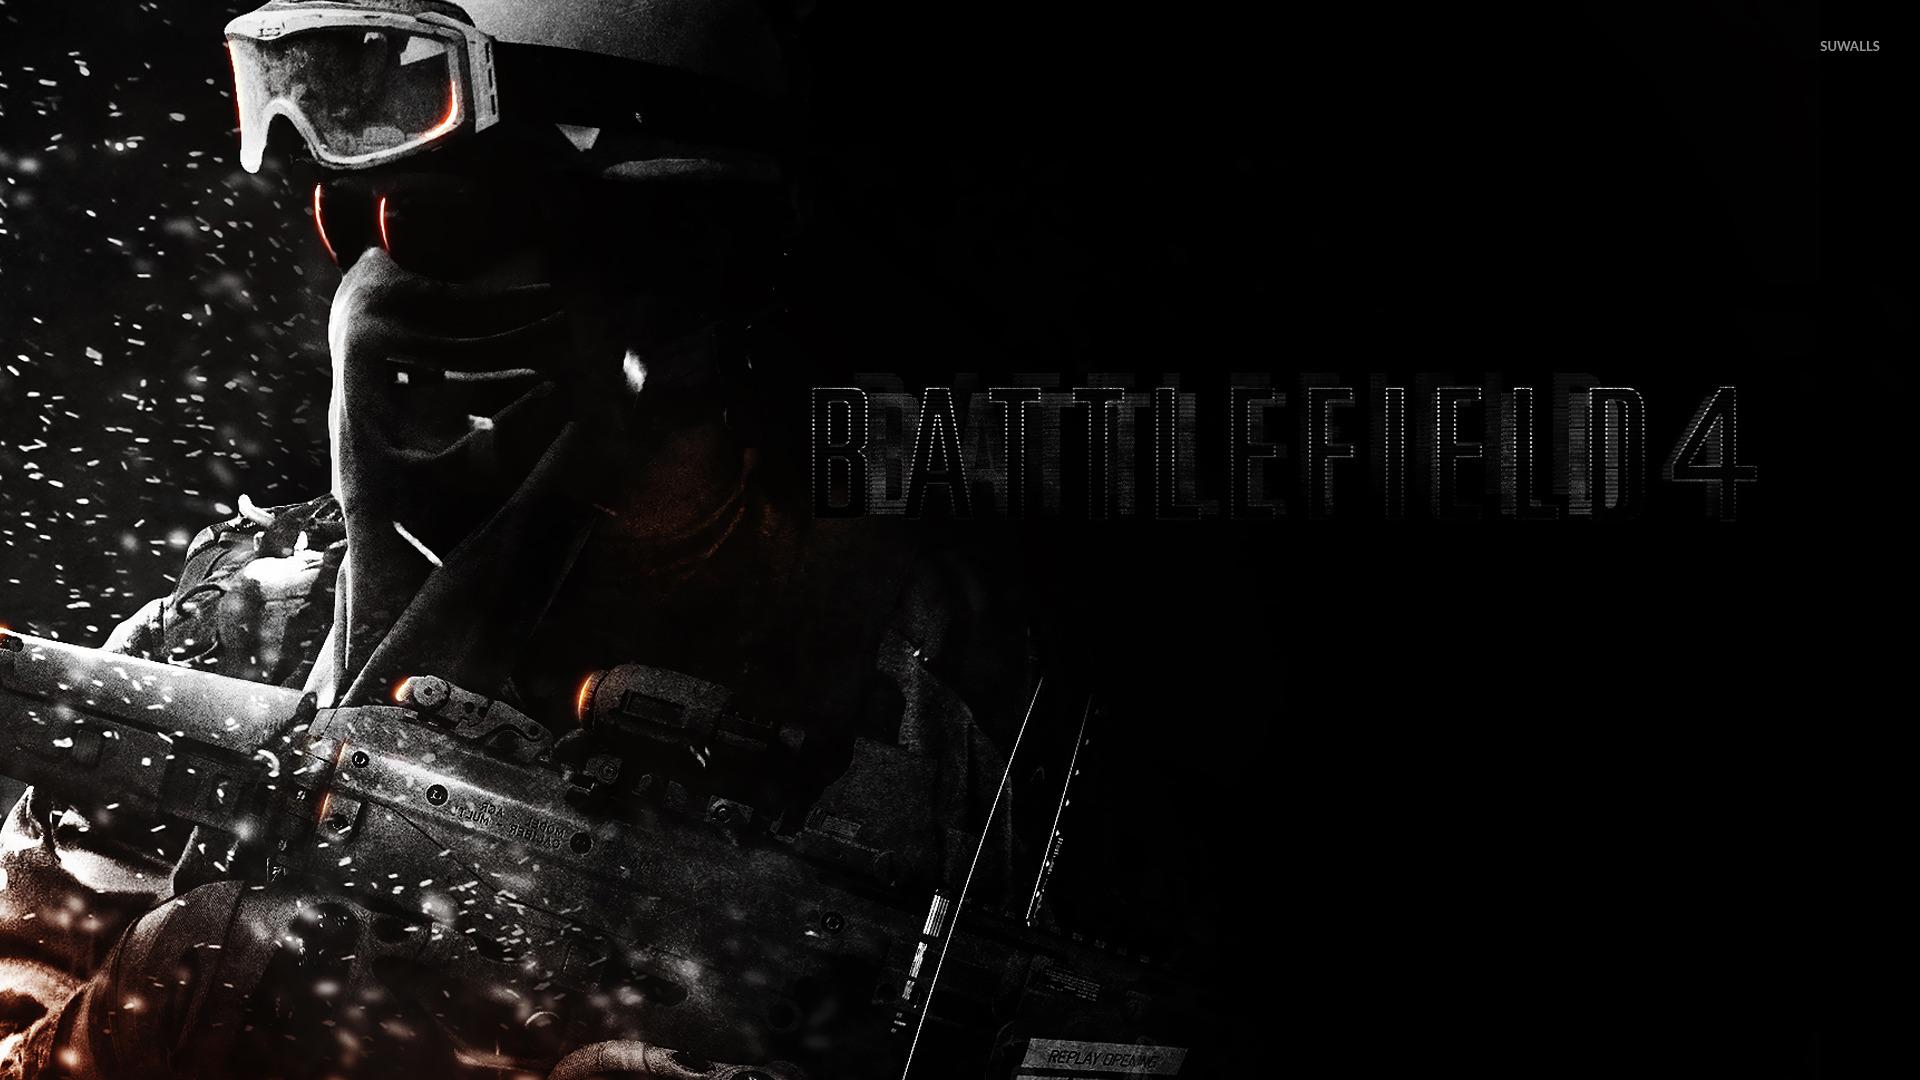 Battlefield 4 9 wallpaper game wallpapers 21377 battlefield 4 9 wallpaper voltagebd Images